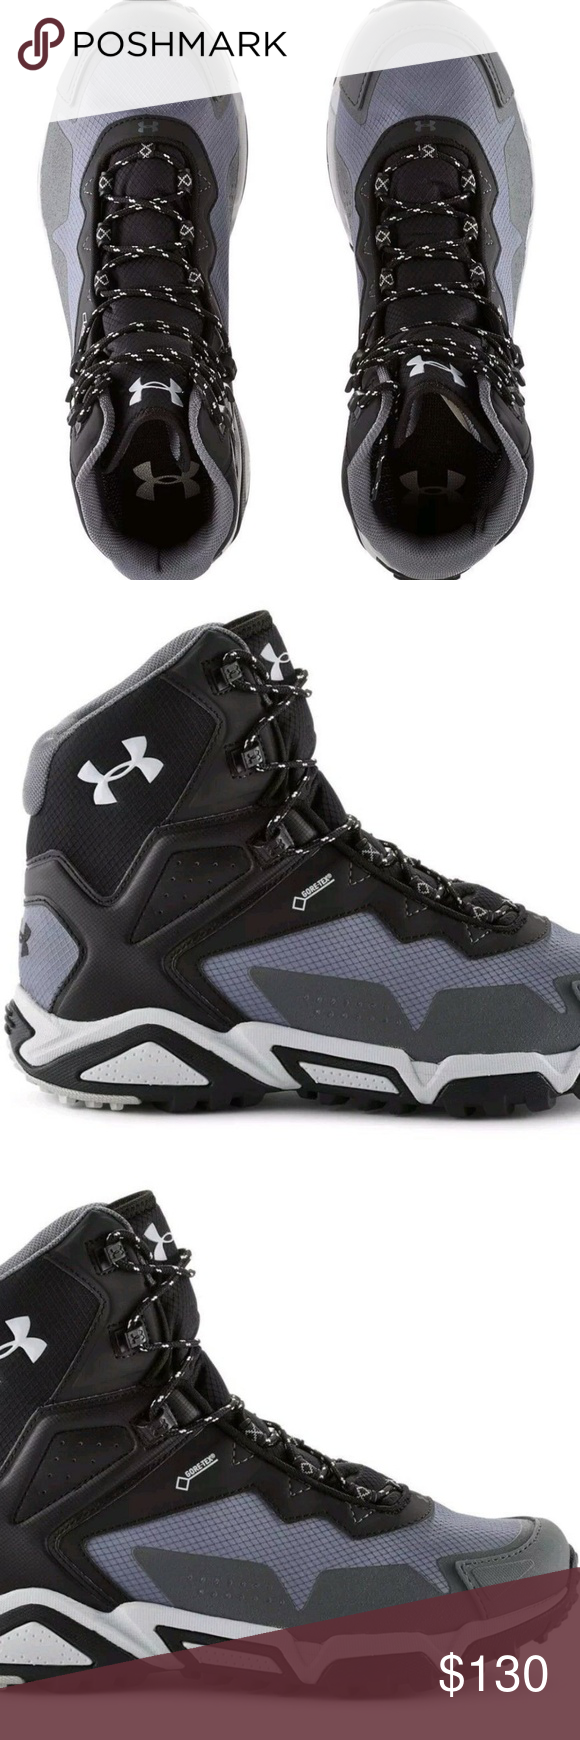 1254918-040 Mens UA Under Armour Tabor Ridge Mid Hiking Boots